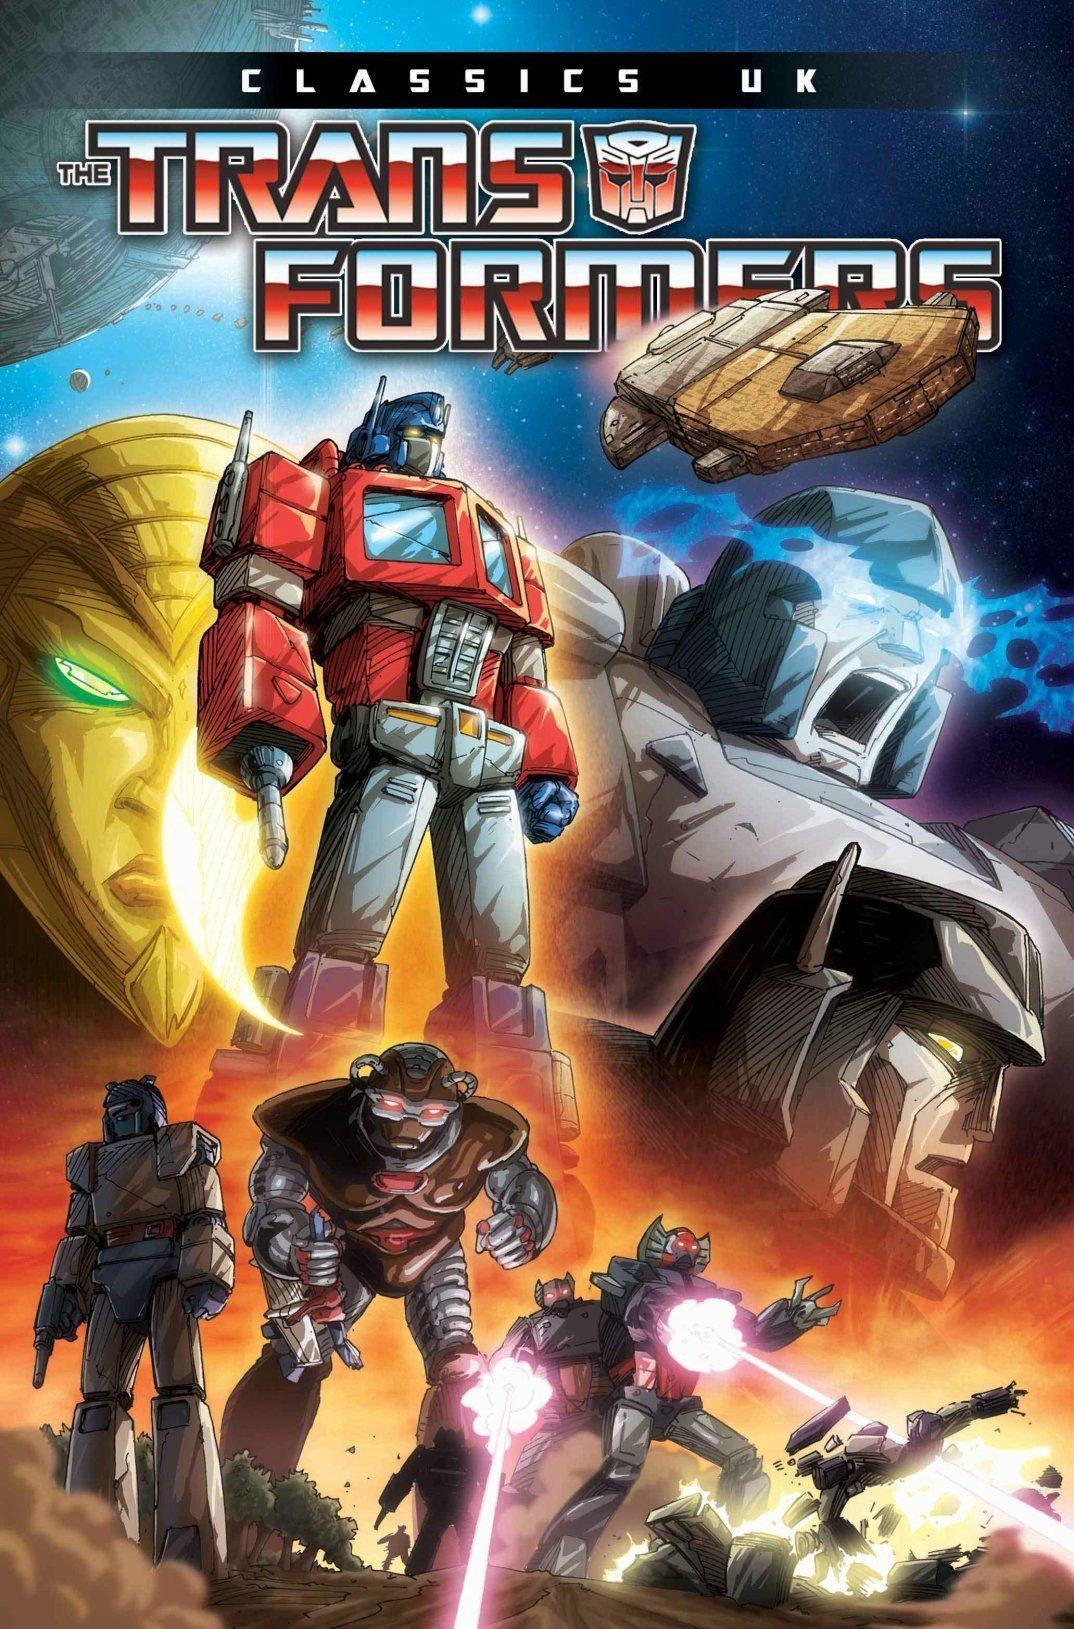 Download Transformers Classics UK Volume 1 PDF